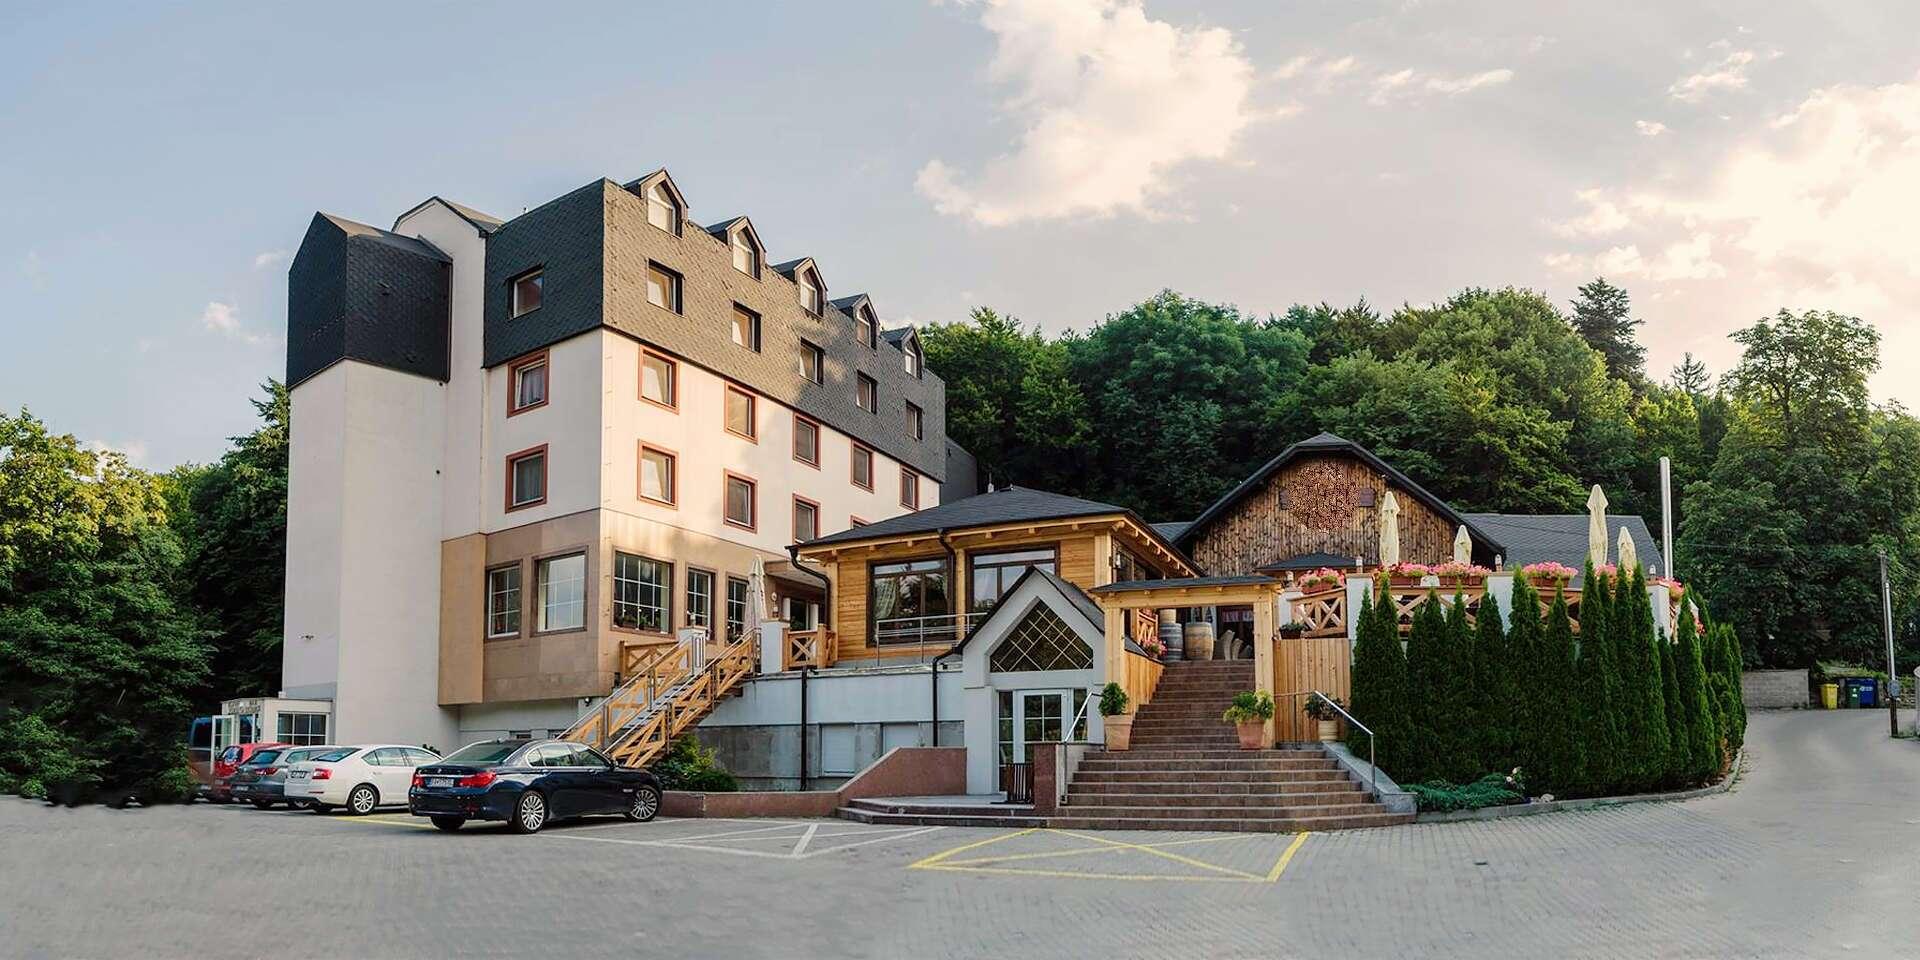 Bratislavský hotel West**** v lone prírody na Kolibe a zároveň len 12 min. autom od centra